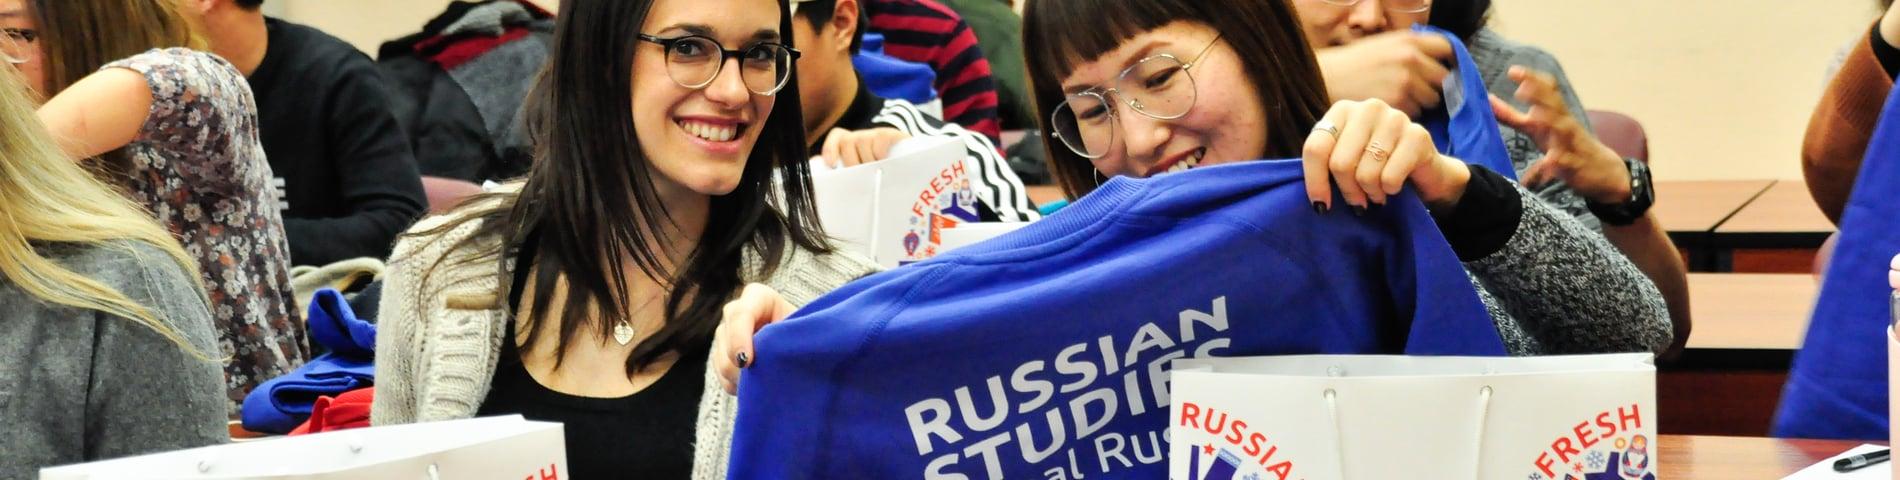 Russian Studies in Real Russia obrazek 1